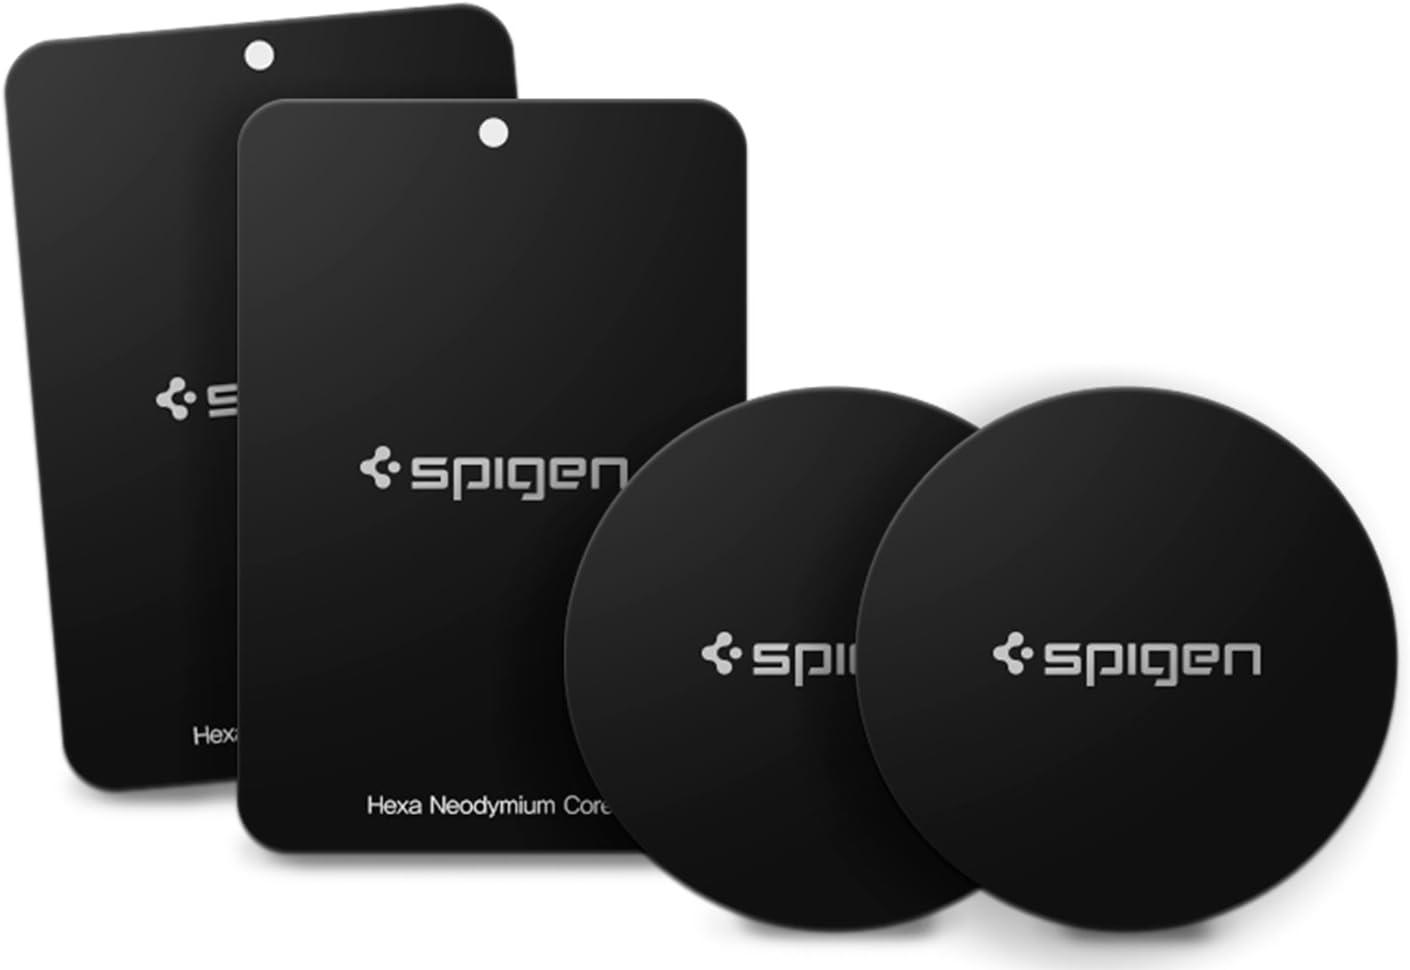 4 Pack - 2 Round, 2 Rectangle Black Spigen Kuel MP4-P Metal Plates for Magnetic Car Mount Phone Holder QNMP Compatible